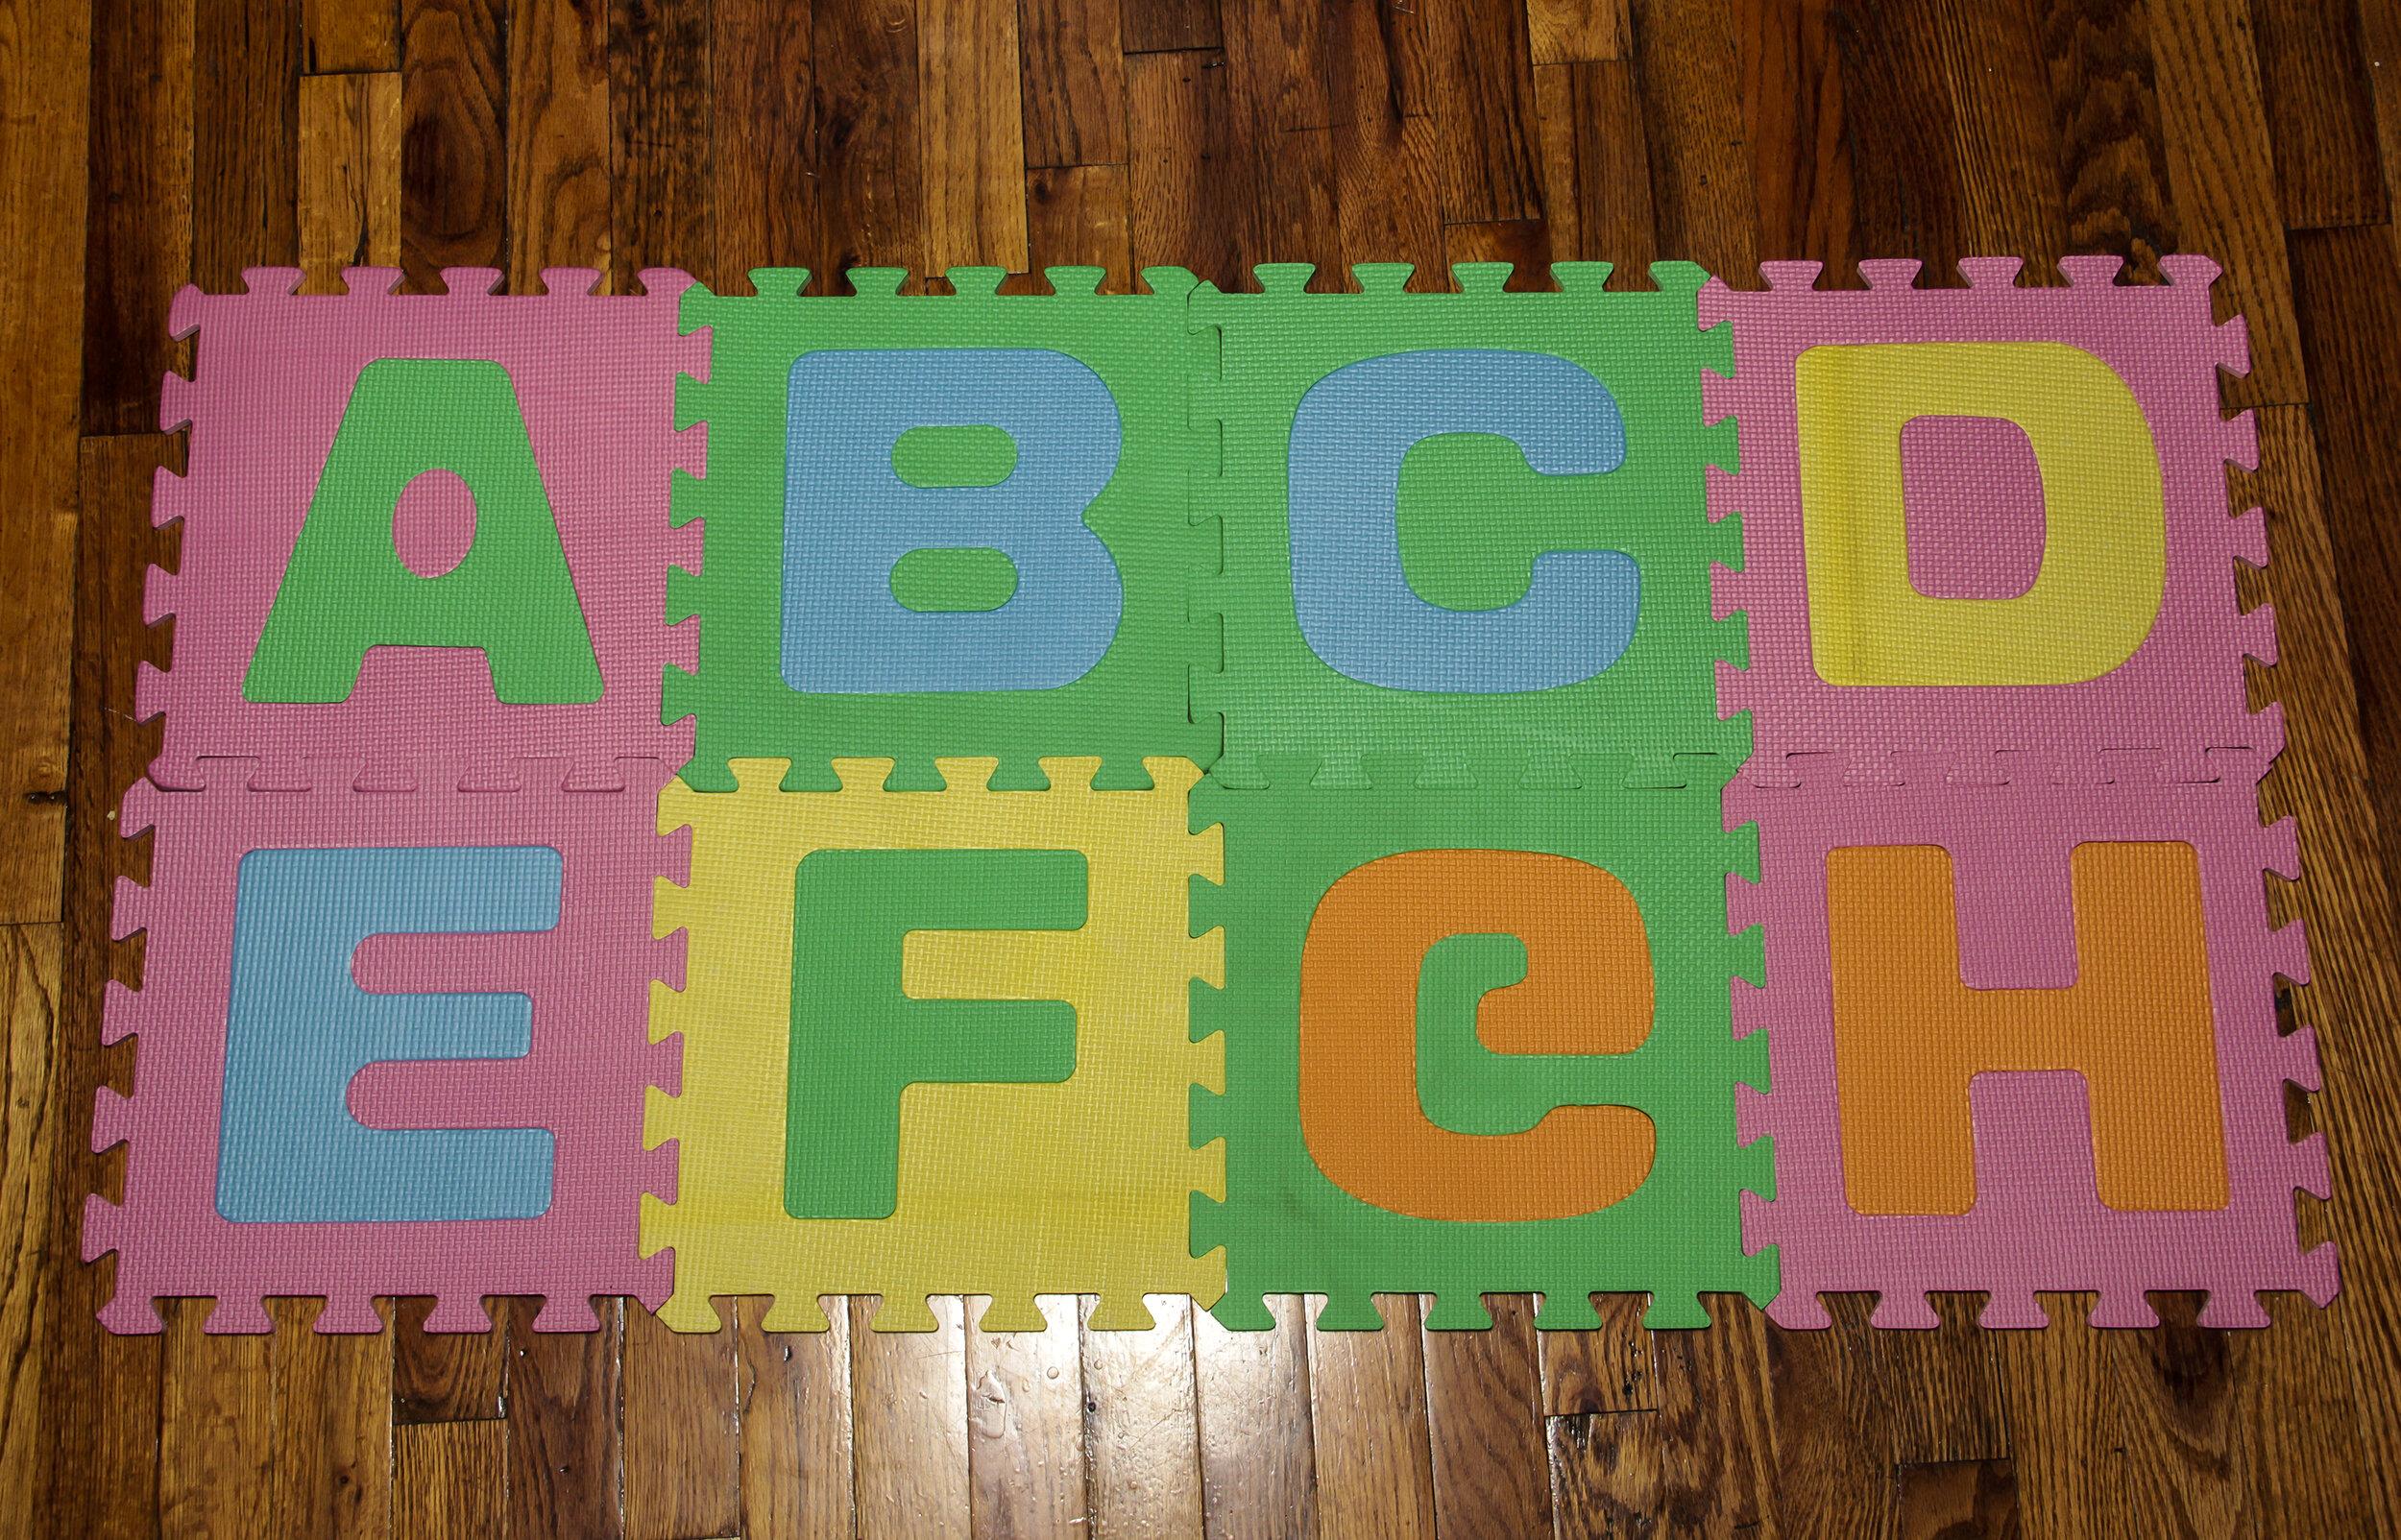 mats foam com spark walmart imagine interlocking abc floor playmat ip create